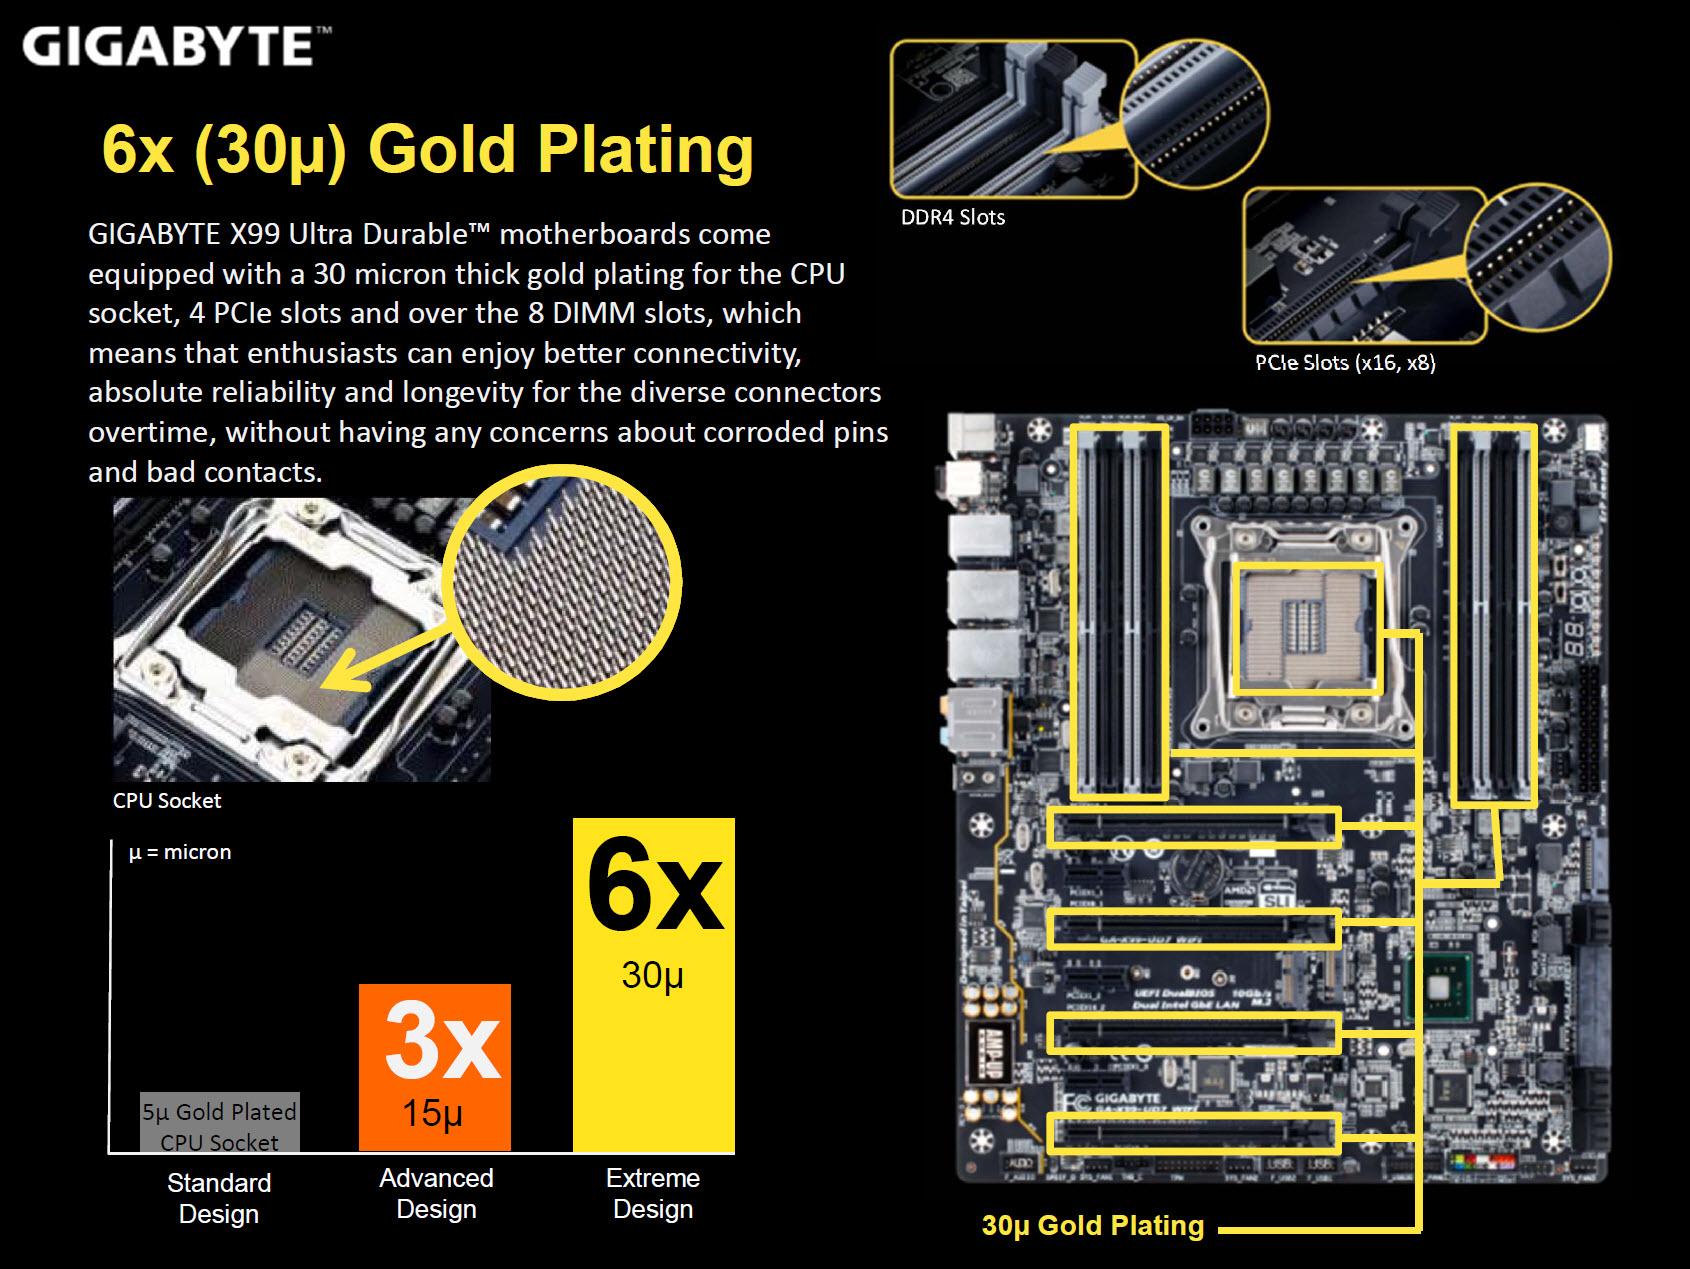 gigabyte-x99-ud7-wifi_gold-plated-socket